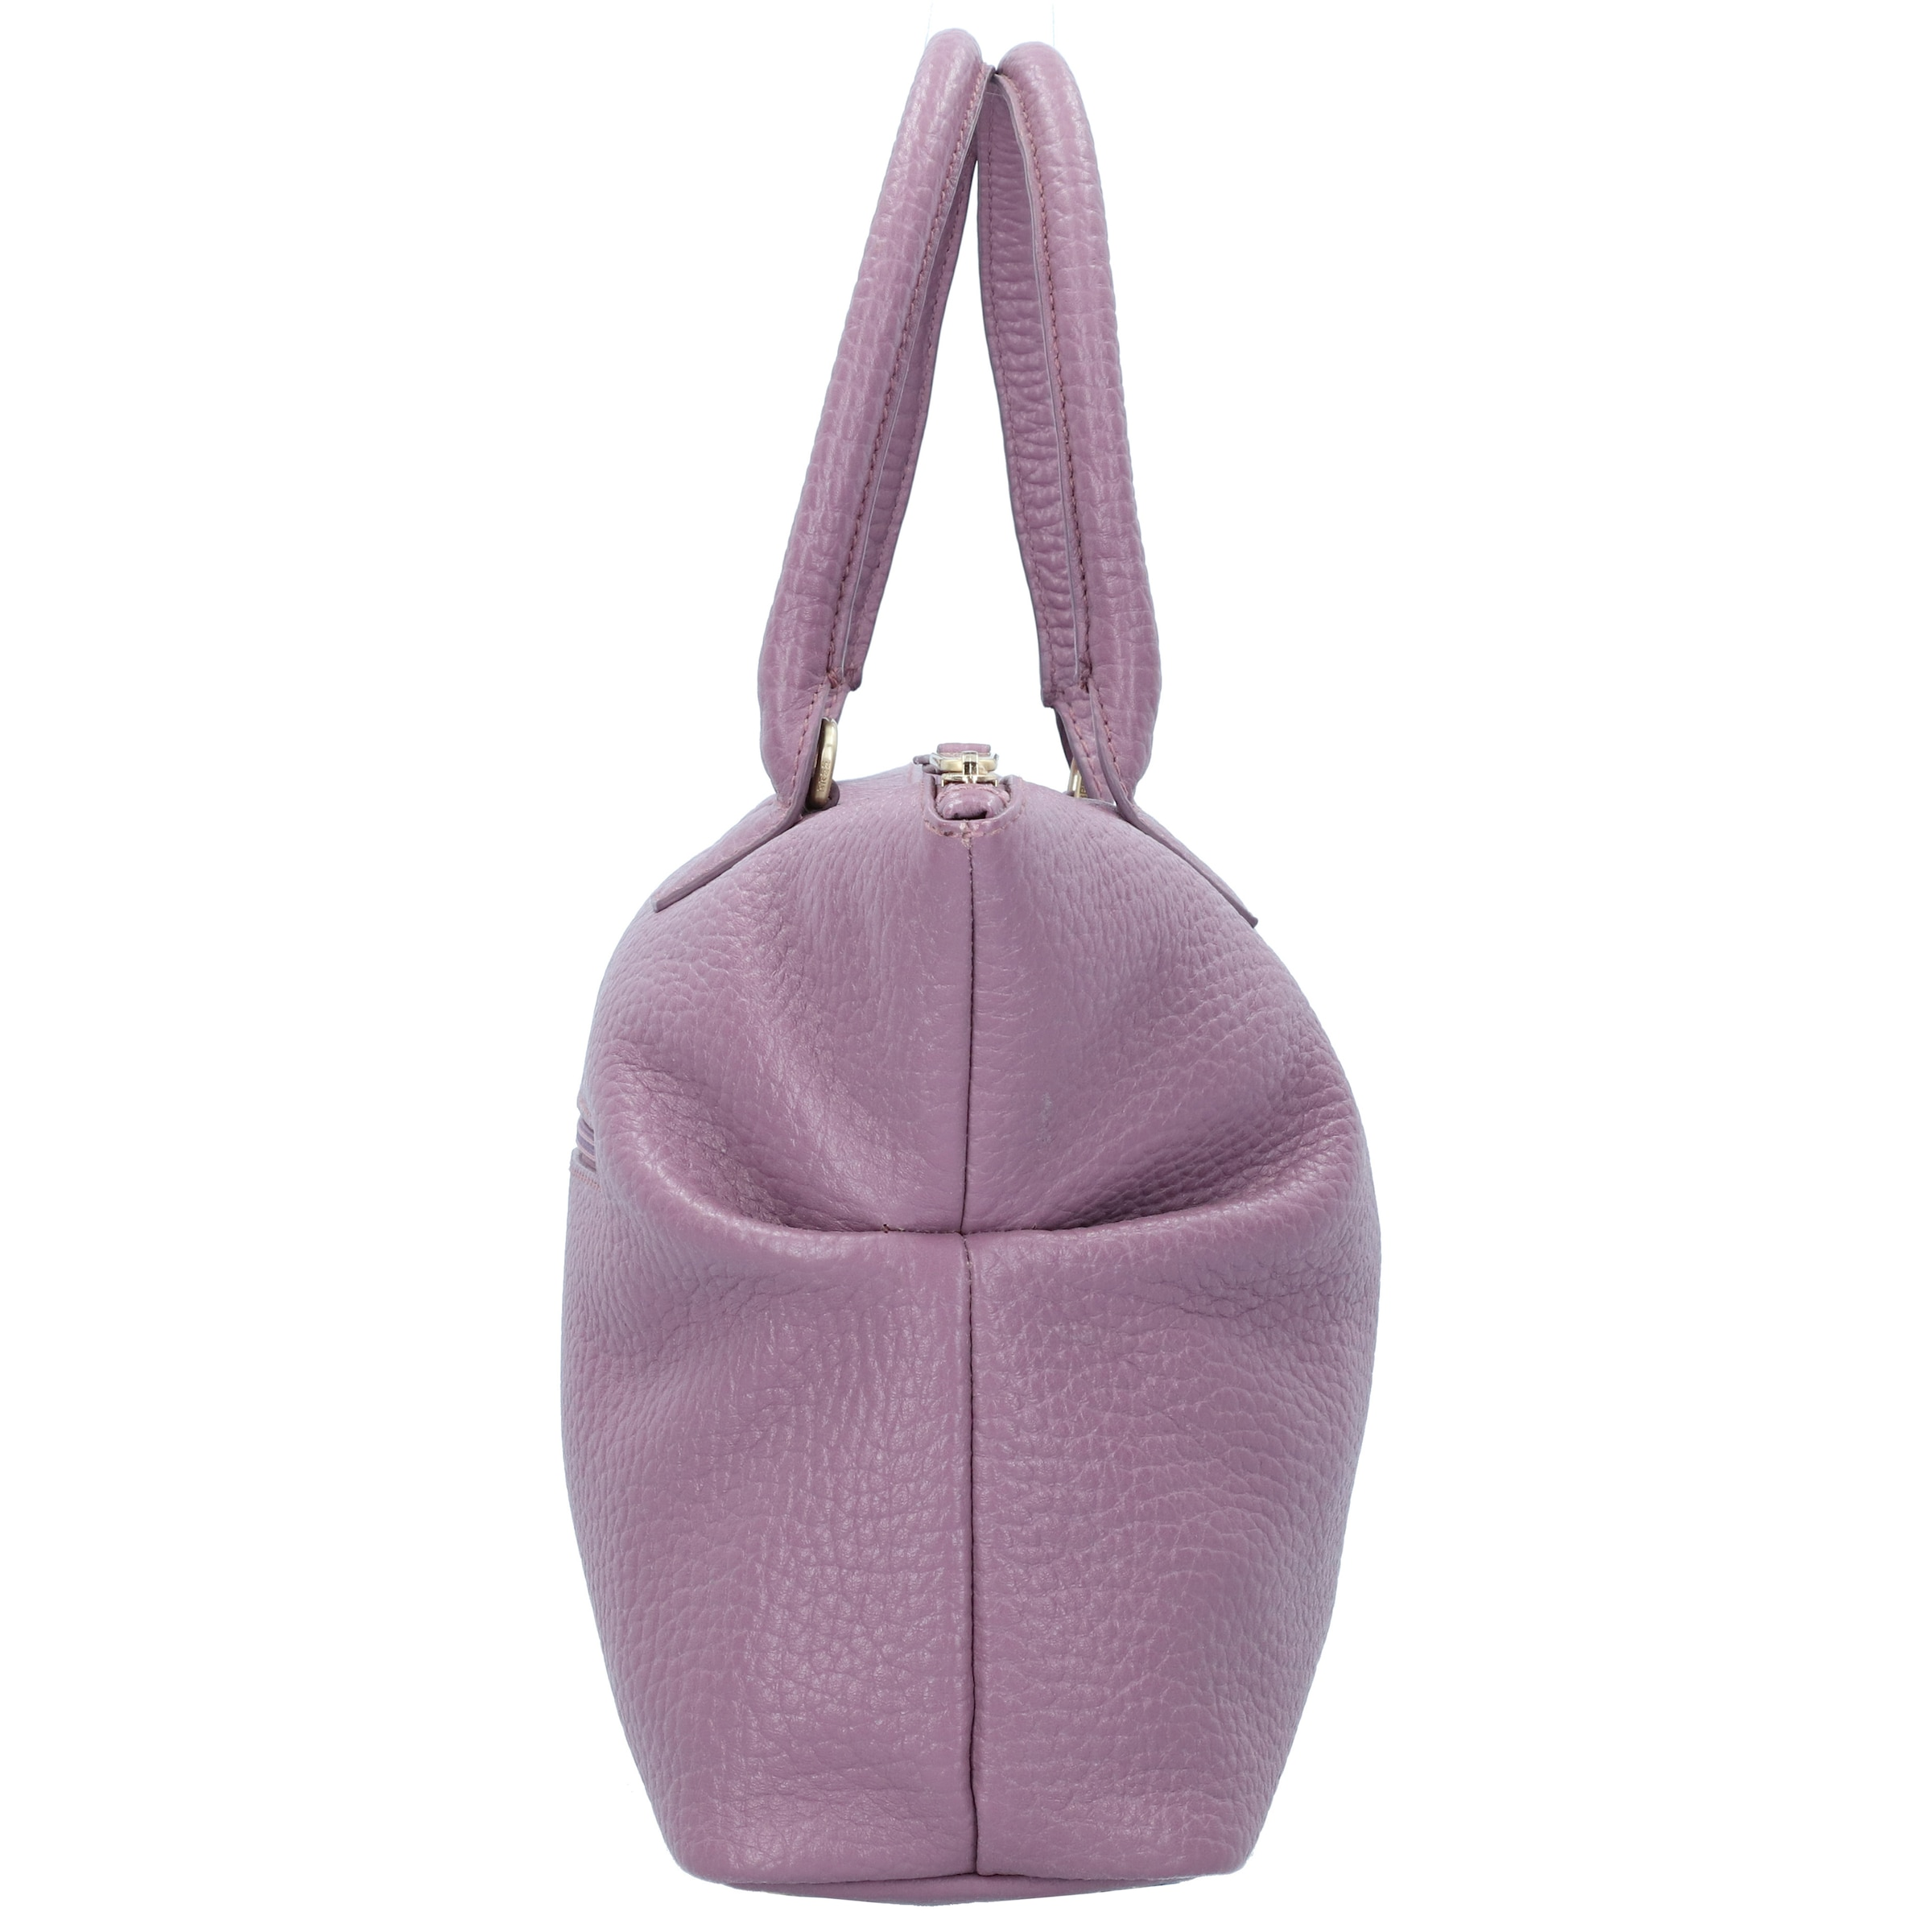 Handtasche Lila Bree In Bree Handtasche Ig76bfYyv